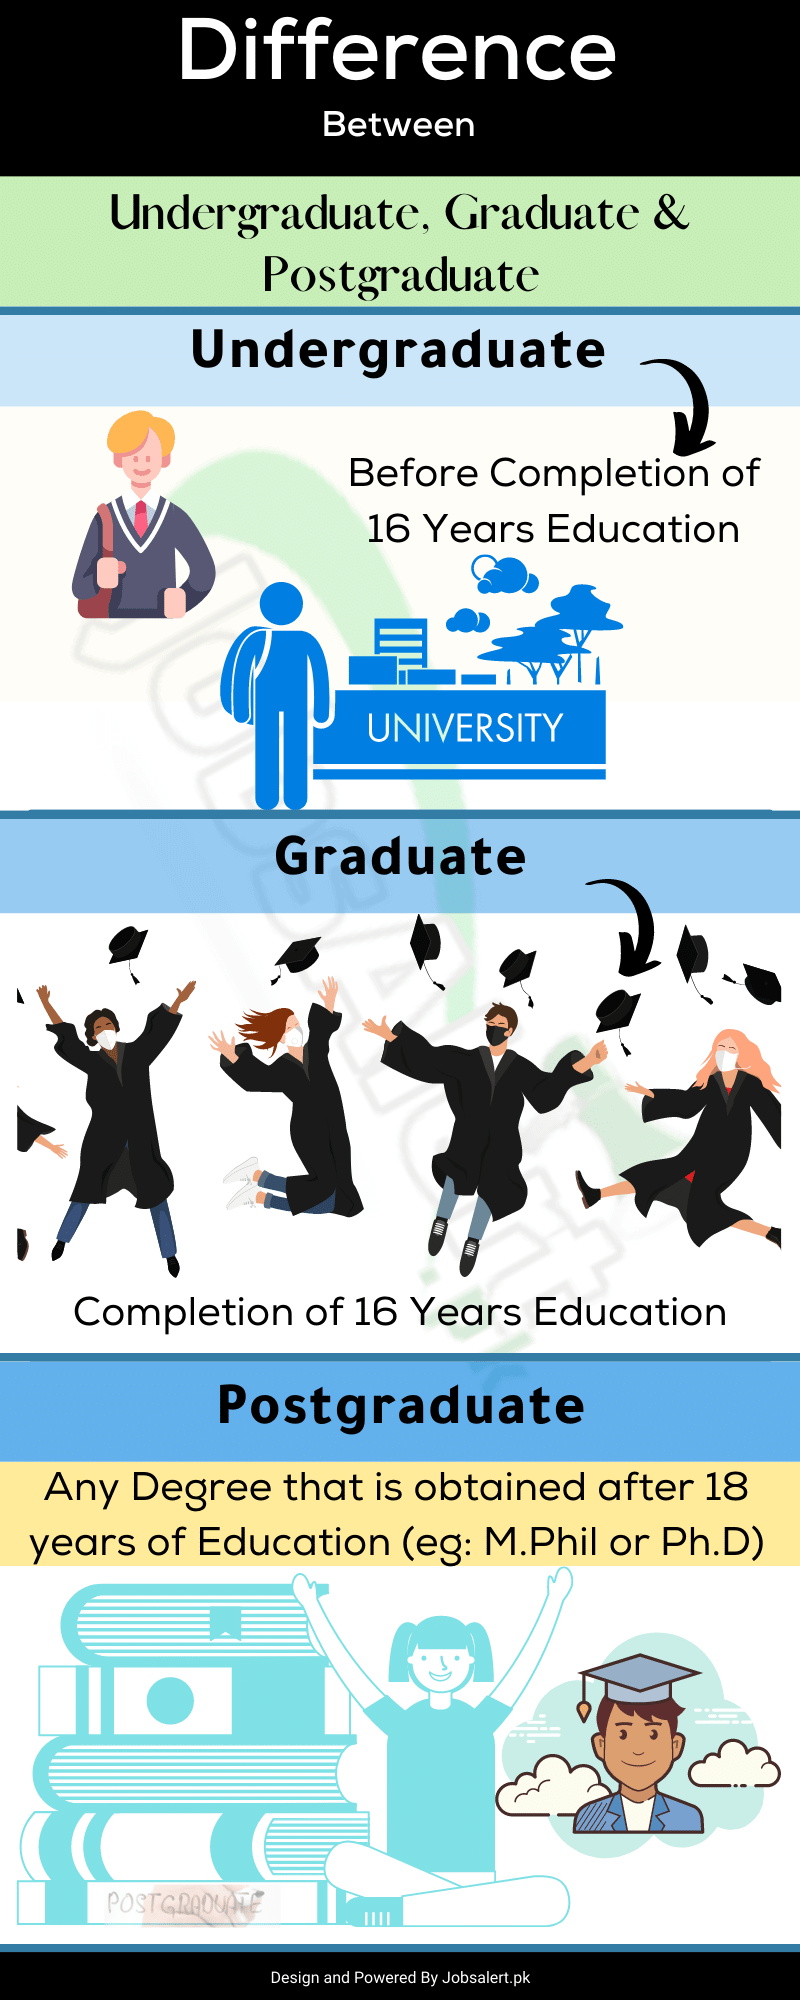 Difference Between Undergraduate, Graduate and Postgraduate in Pakistan